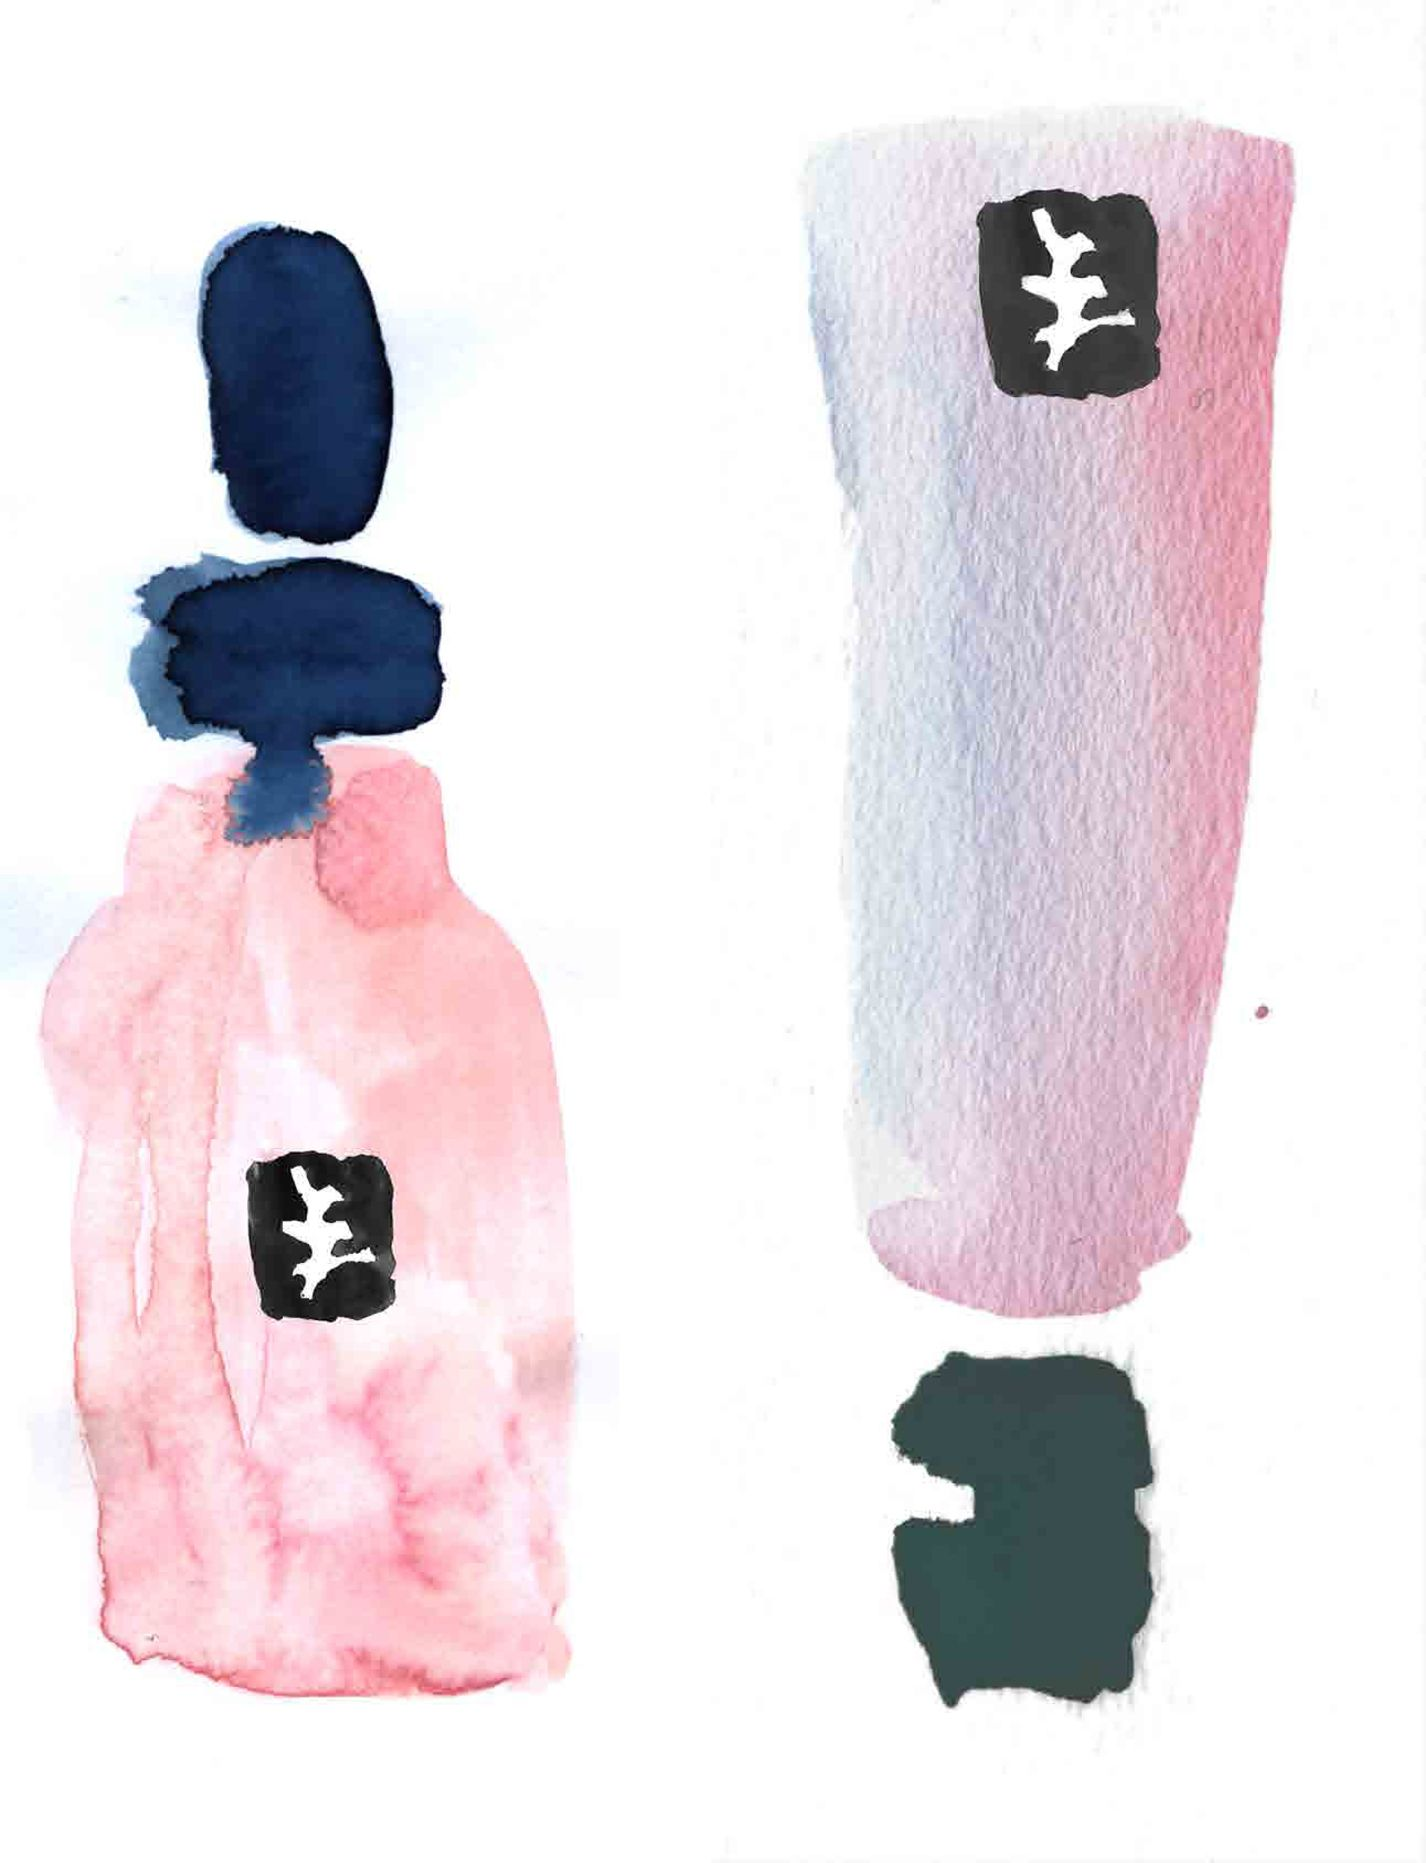 Julia Perrin cosmetic New : #illustration #juliaperrin #cosmetic #beauty #erichennebertagency